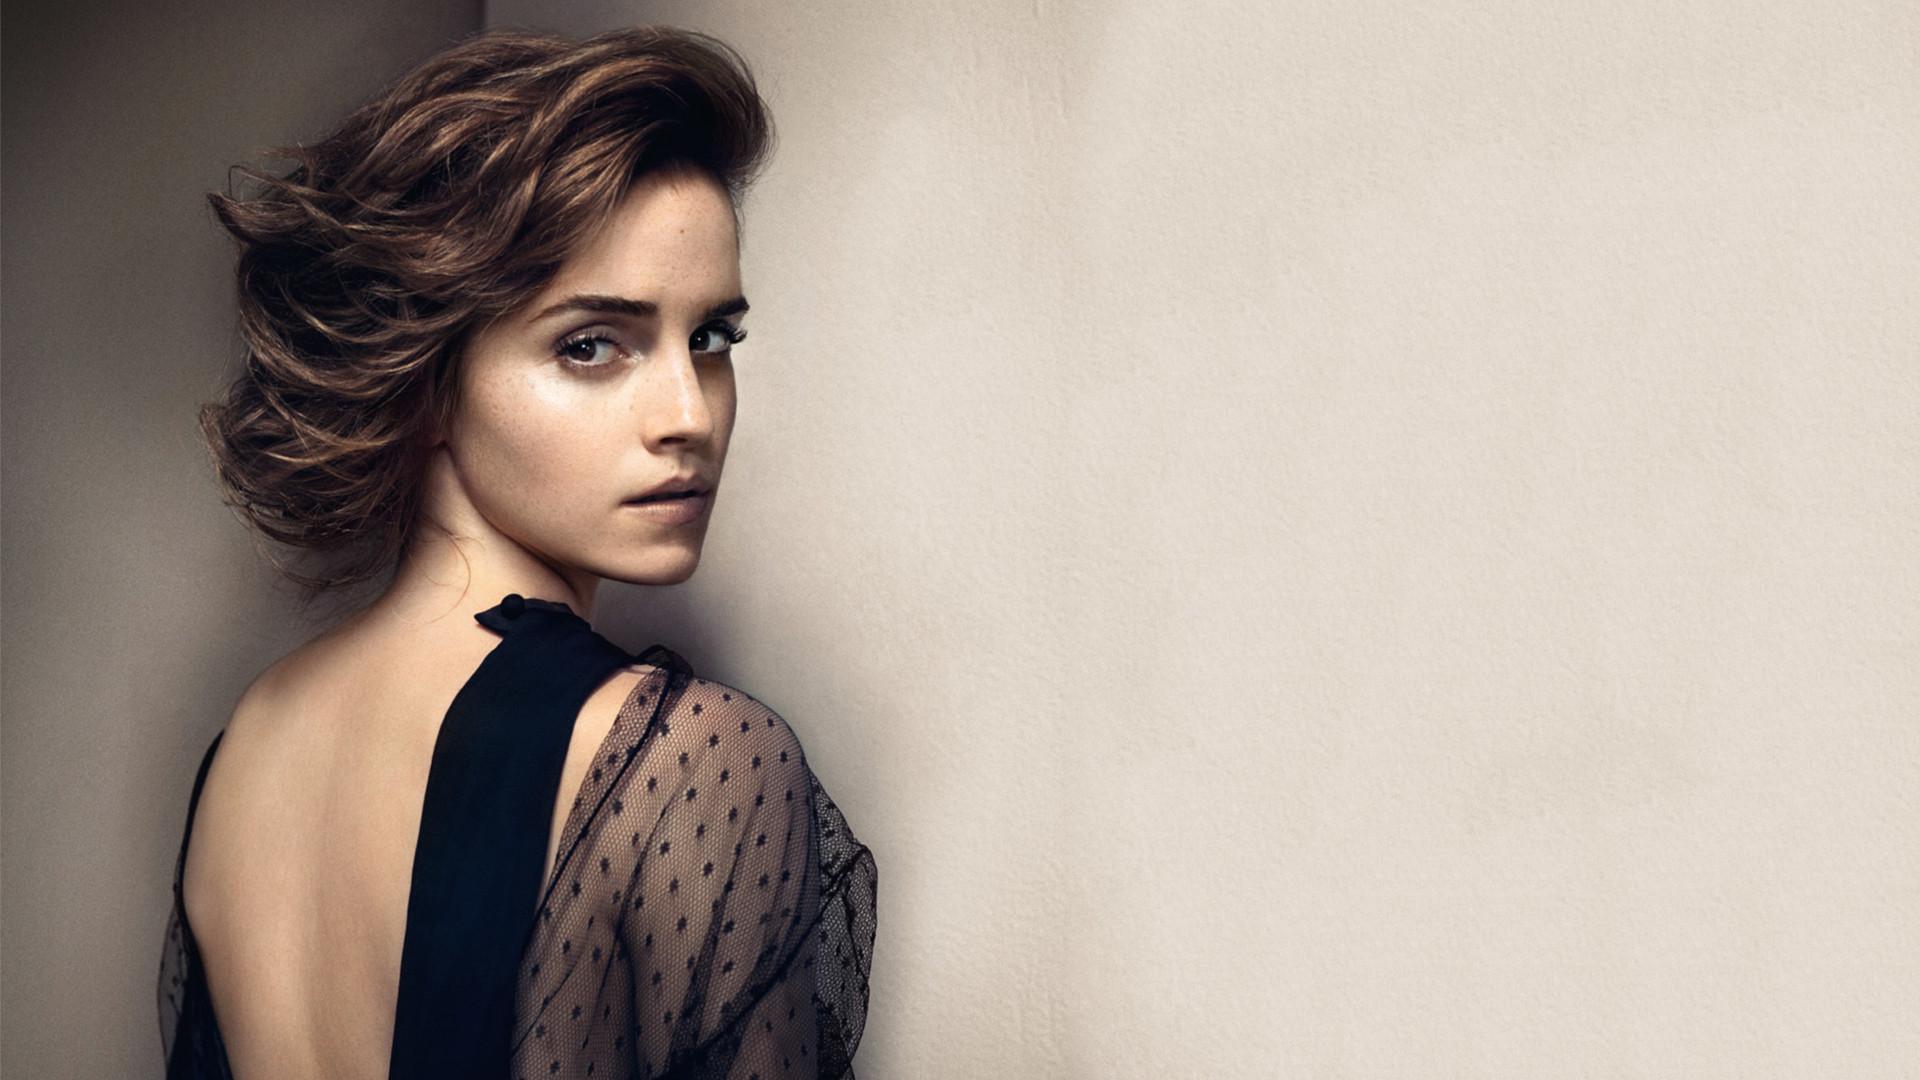 Hd wallpaper emma watson - Hot And Sexy Emma Watson Hd Wallpapers 1080p Download Free